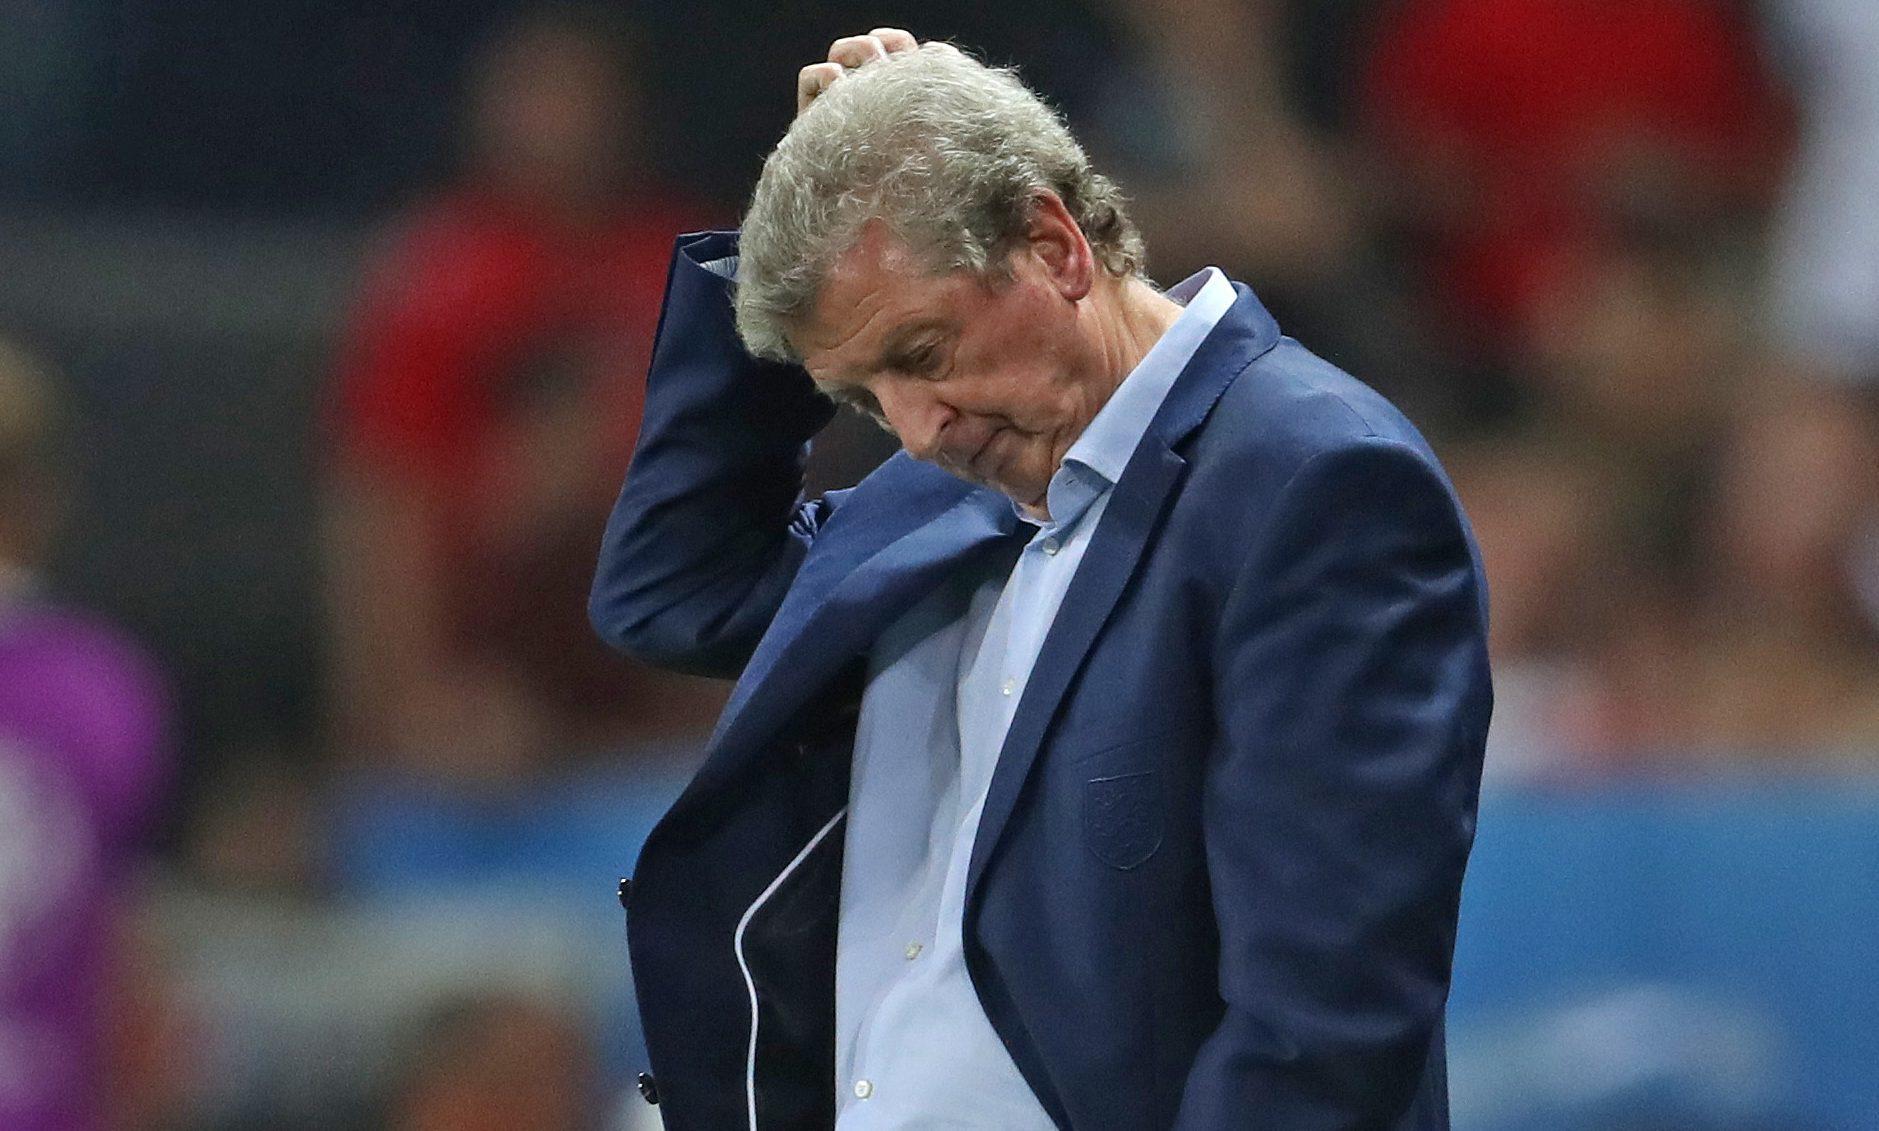 Roy Hodgson looks on as England fall to Iceland.